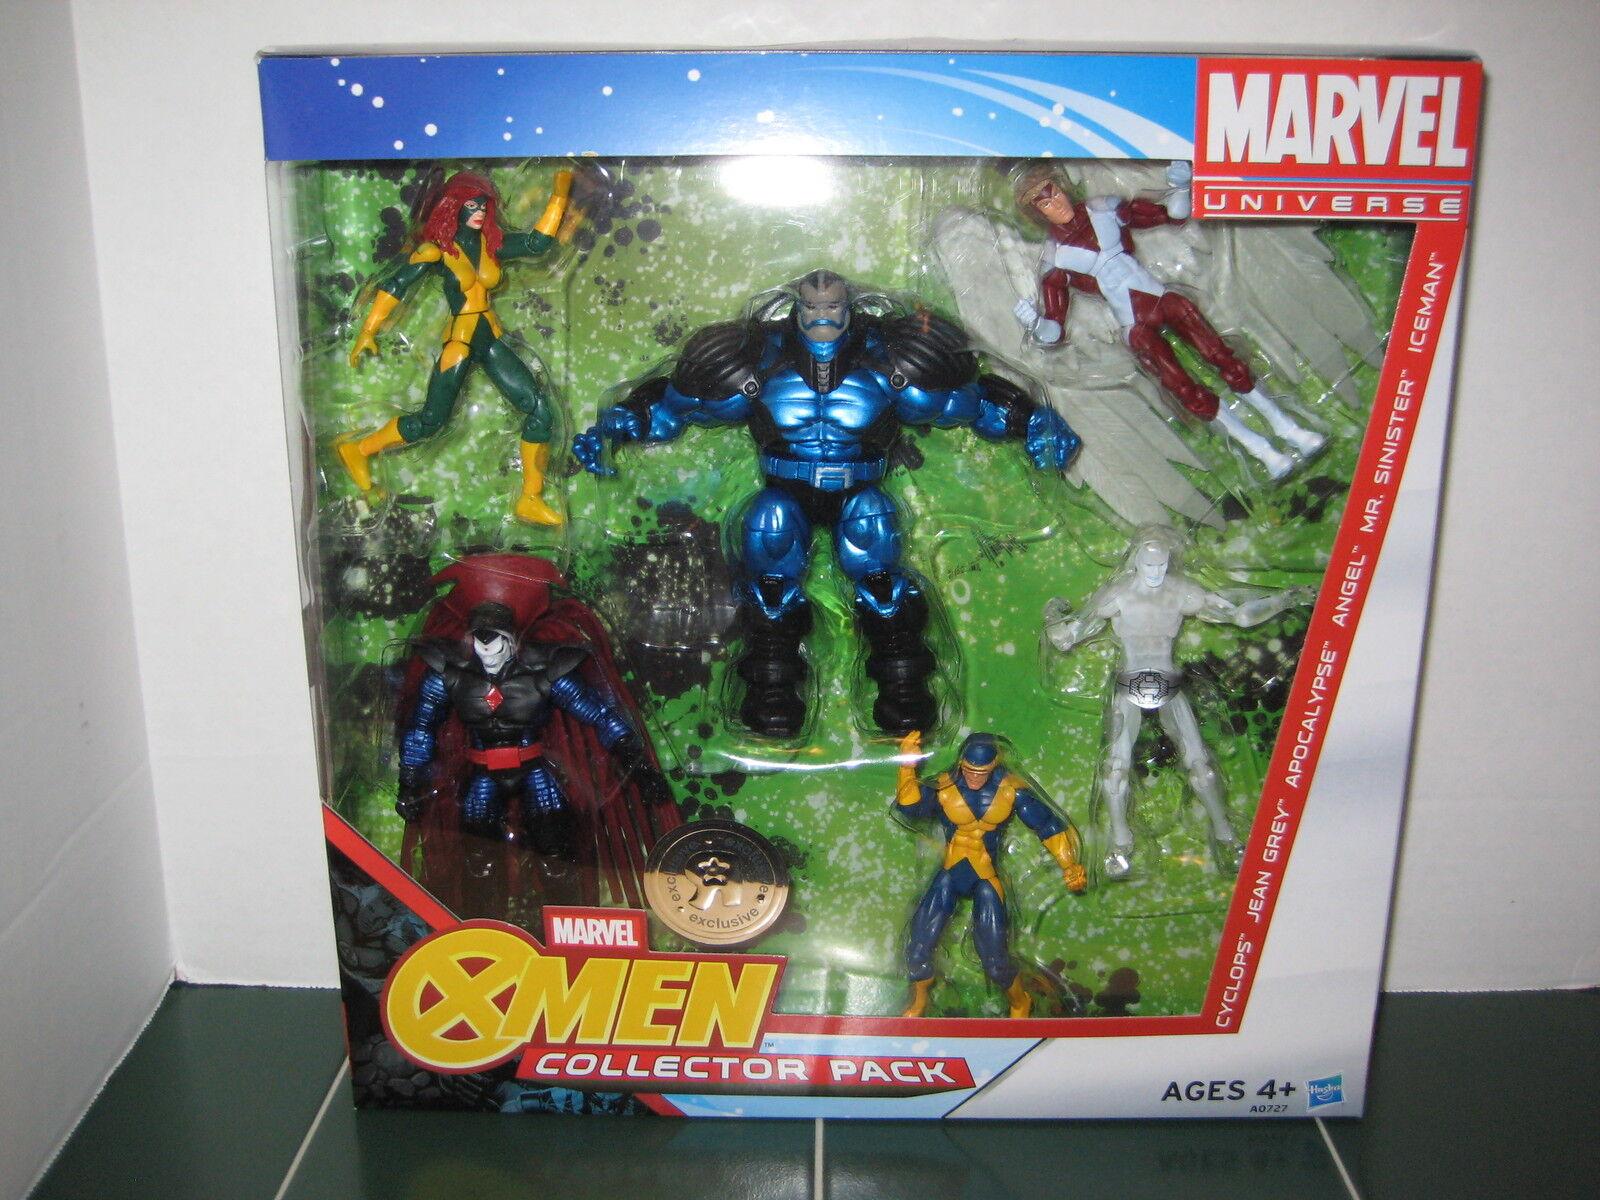 Marvel - universum  x - men  exklusives paket zyklop jean grau apokalypse engel iceman